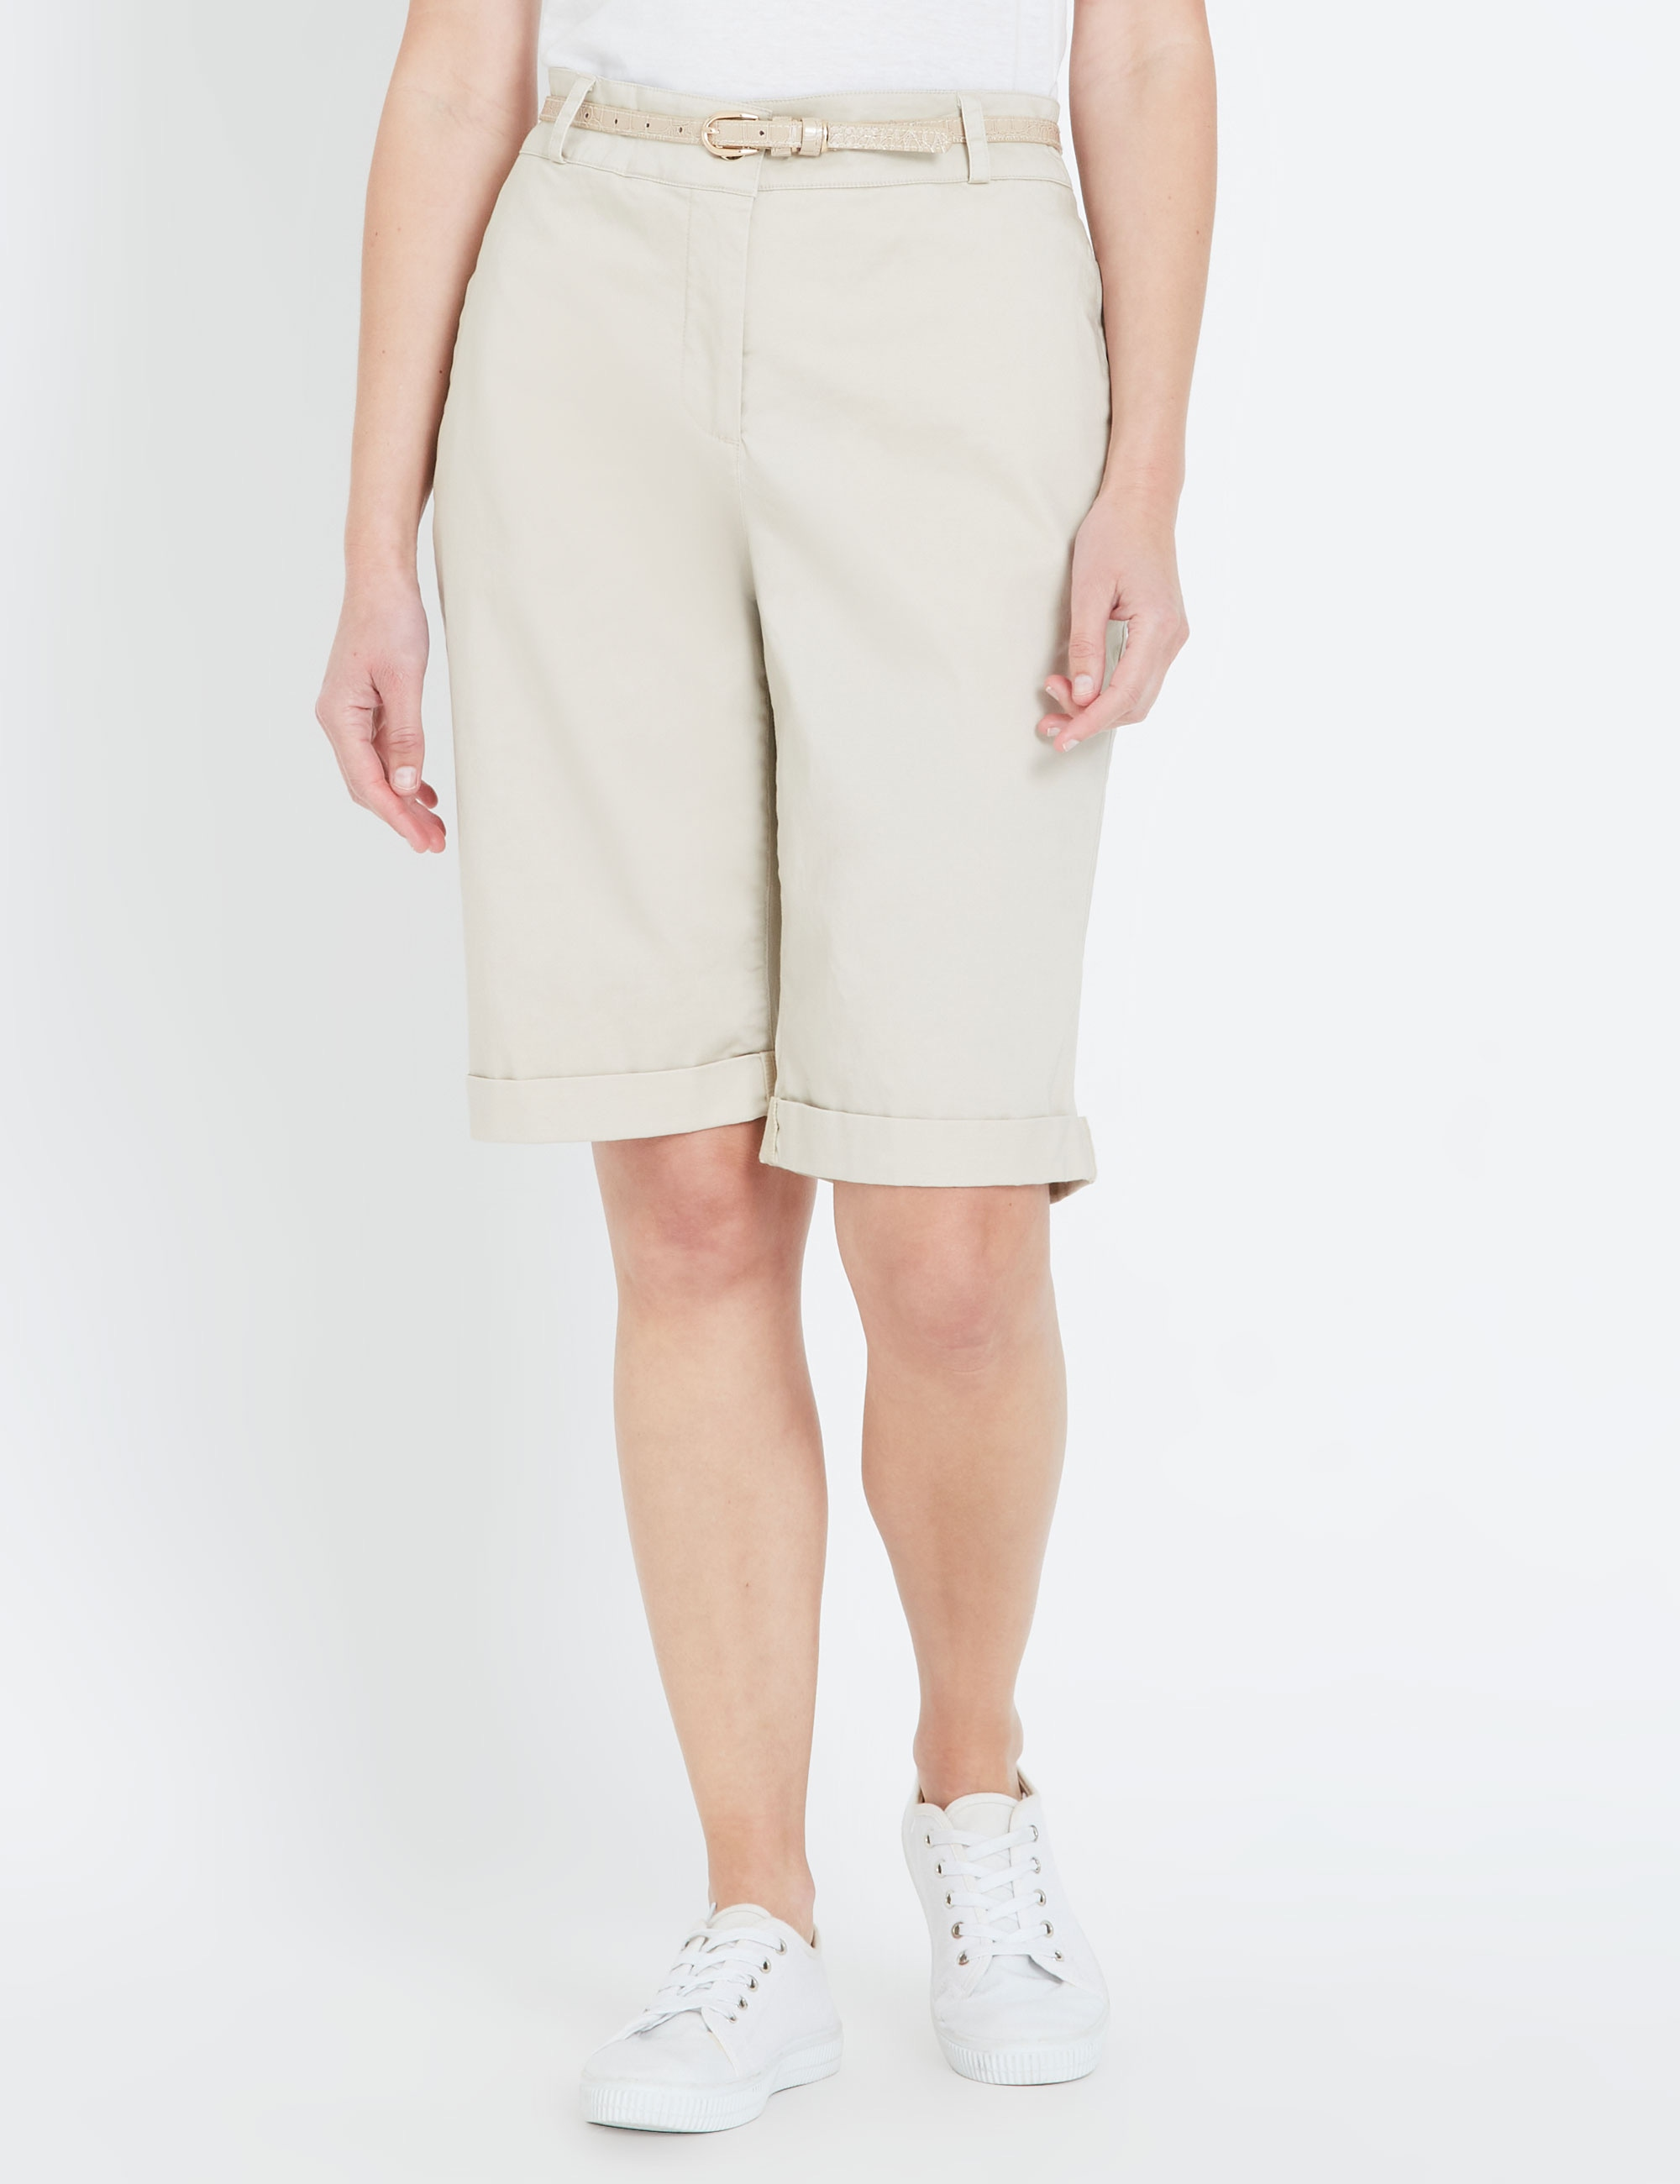 1055207140 1 - Women Fashion